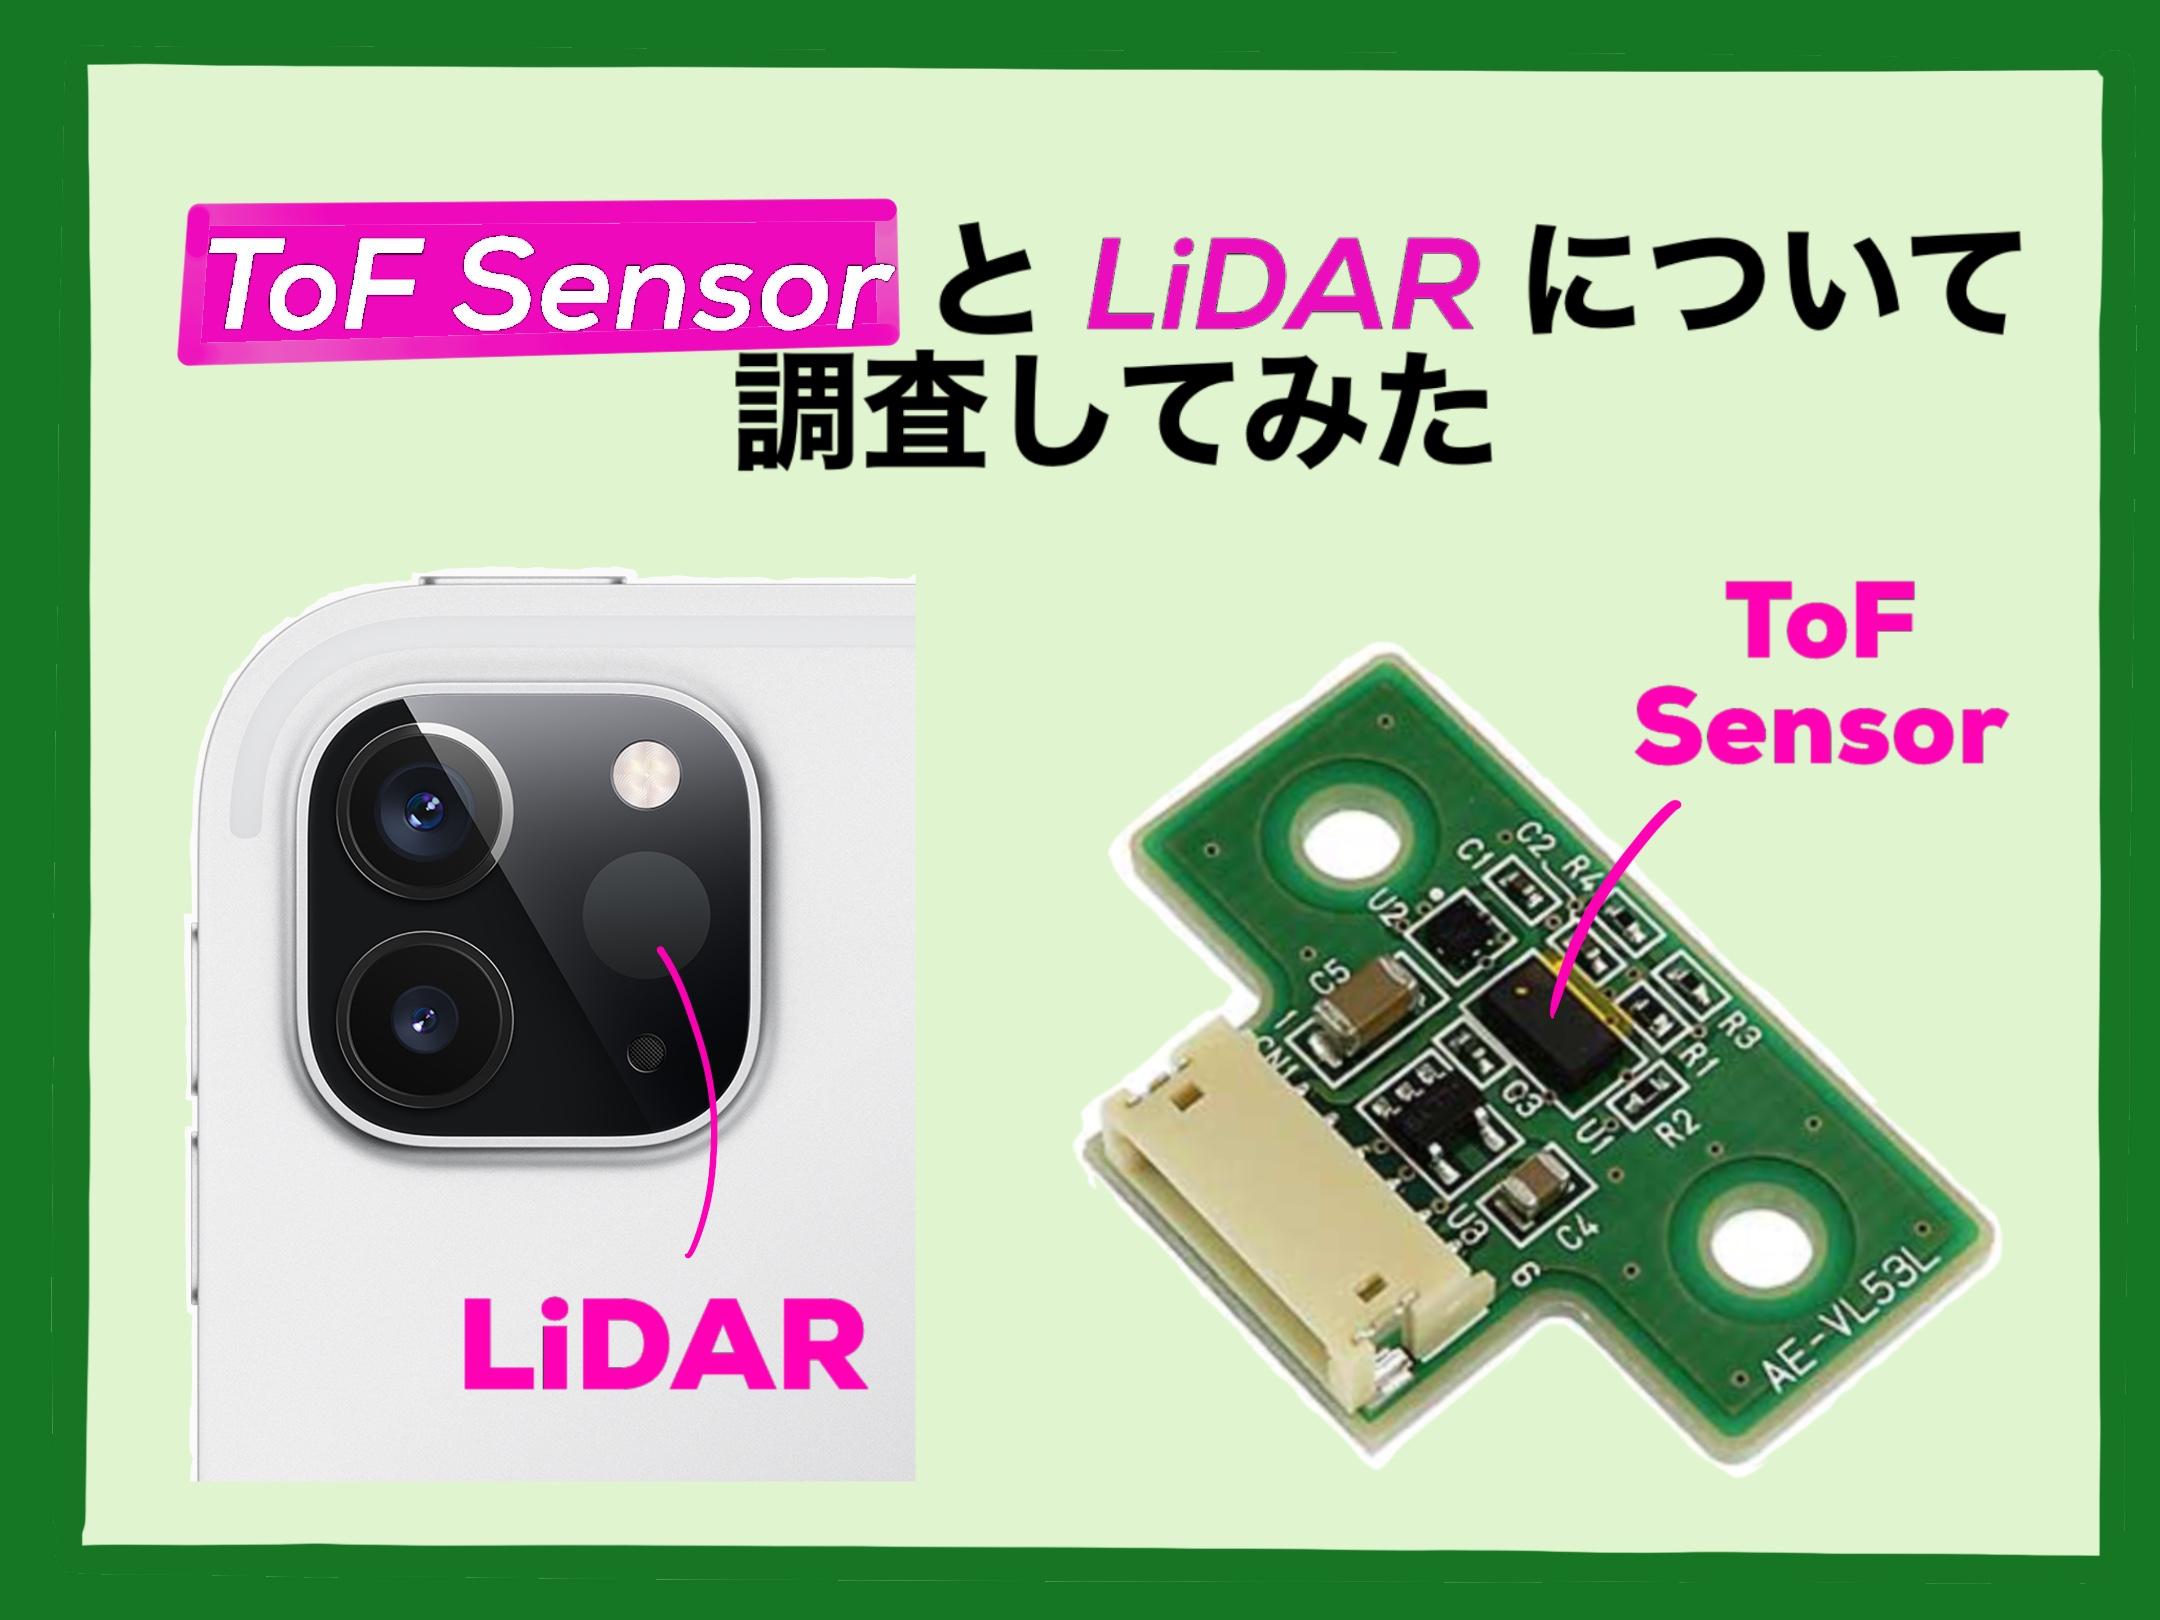 ToF and Lidar